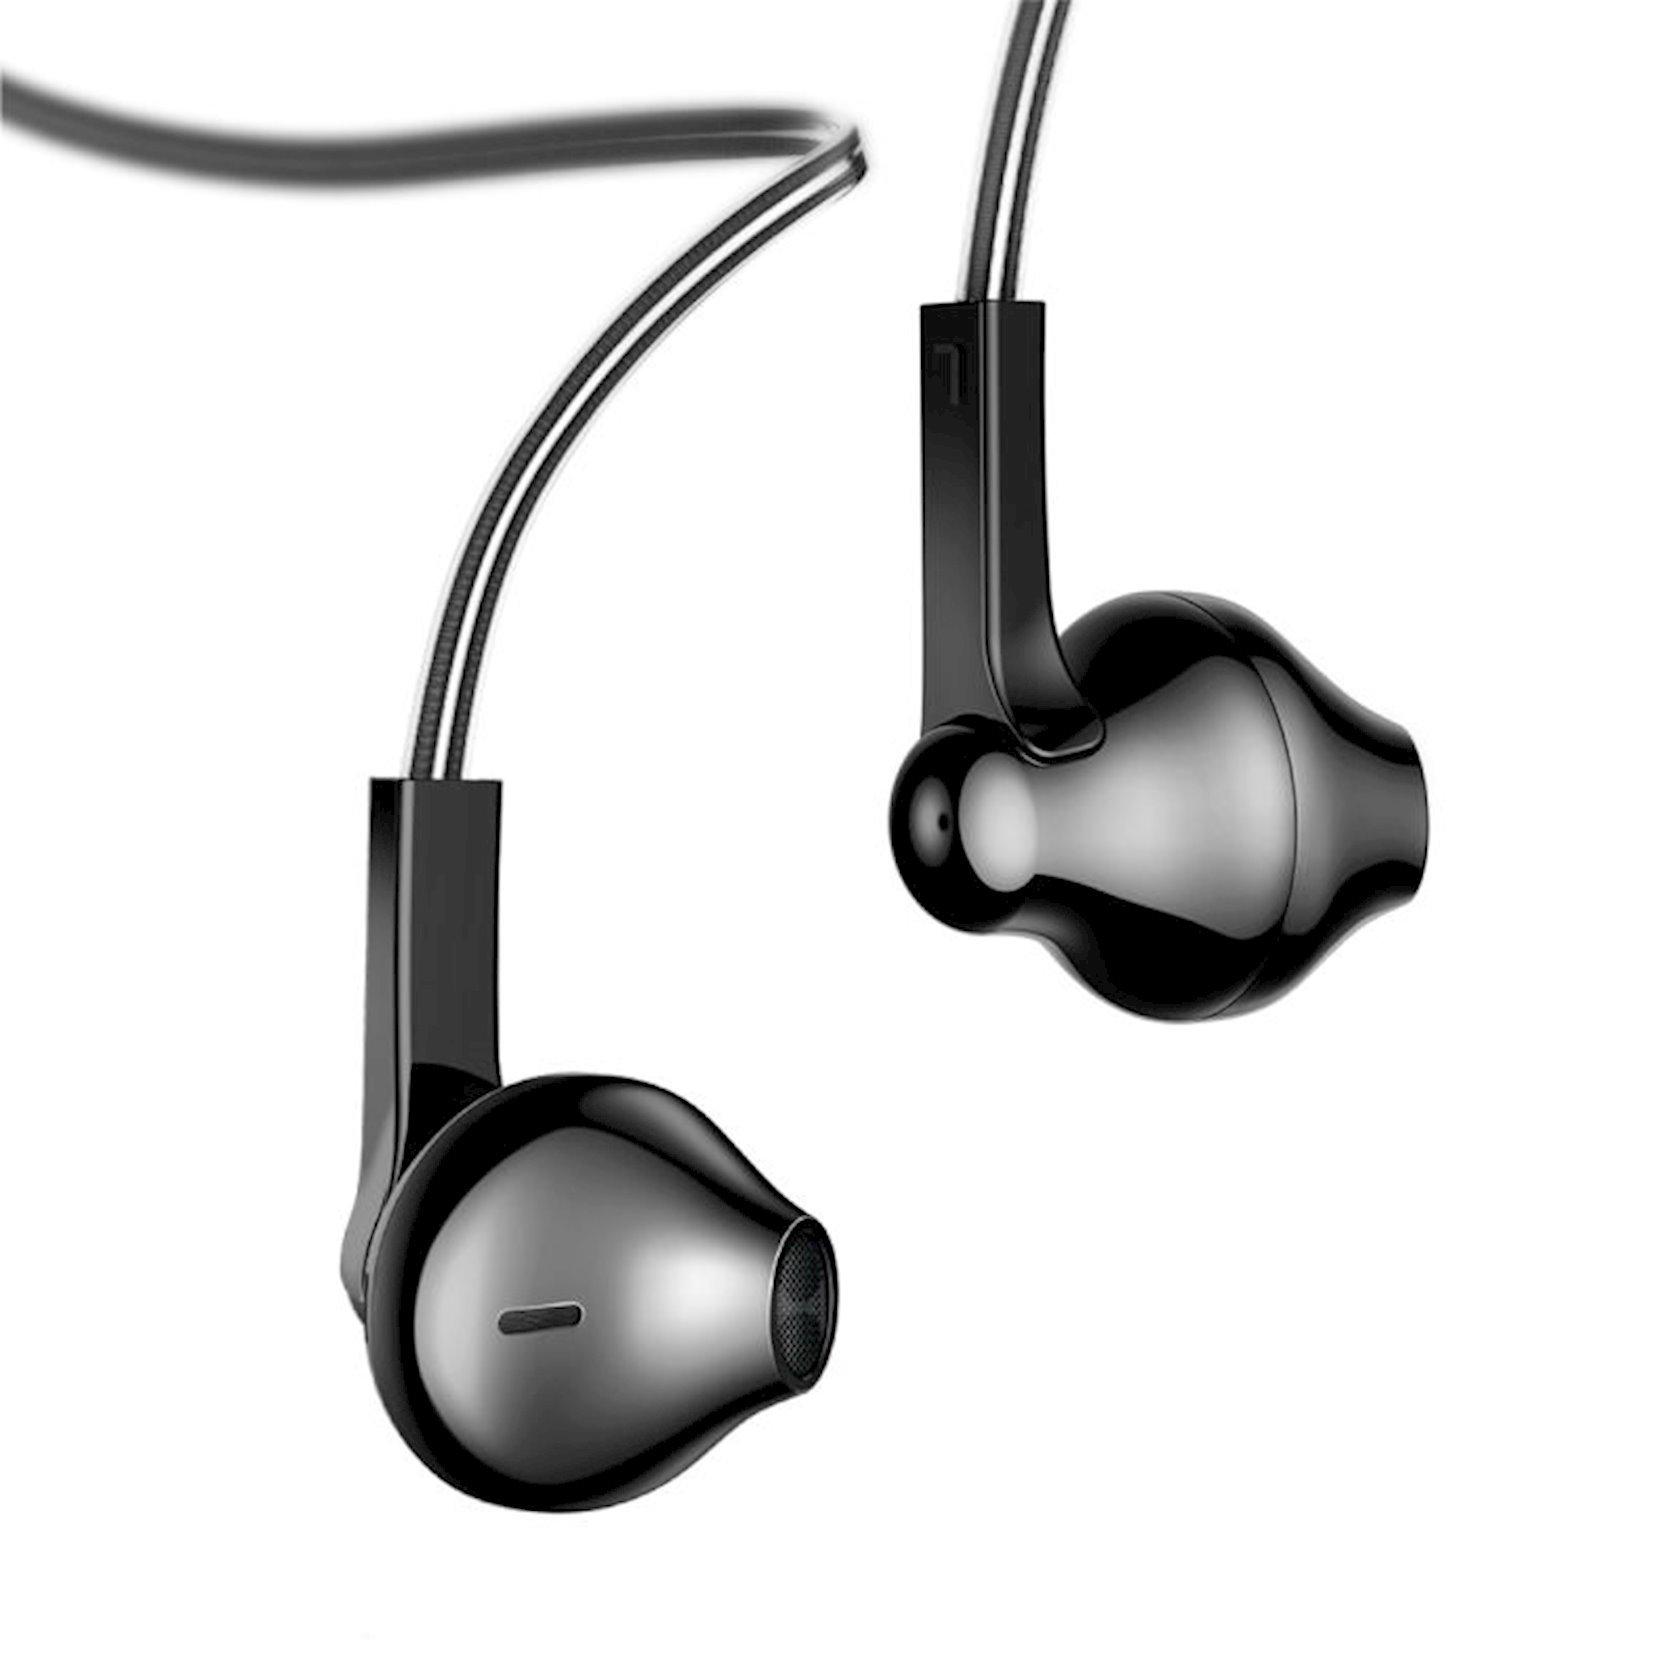 Simli qulaqlıqlar Baseus Encok wire earphones H03